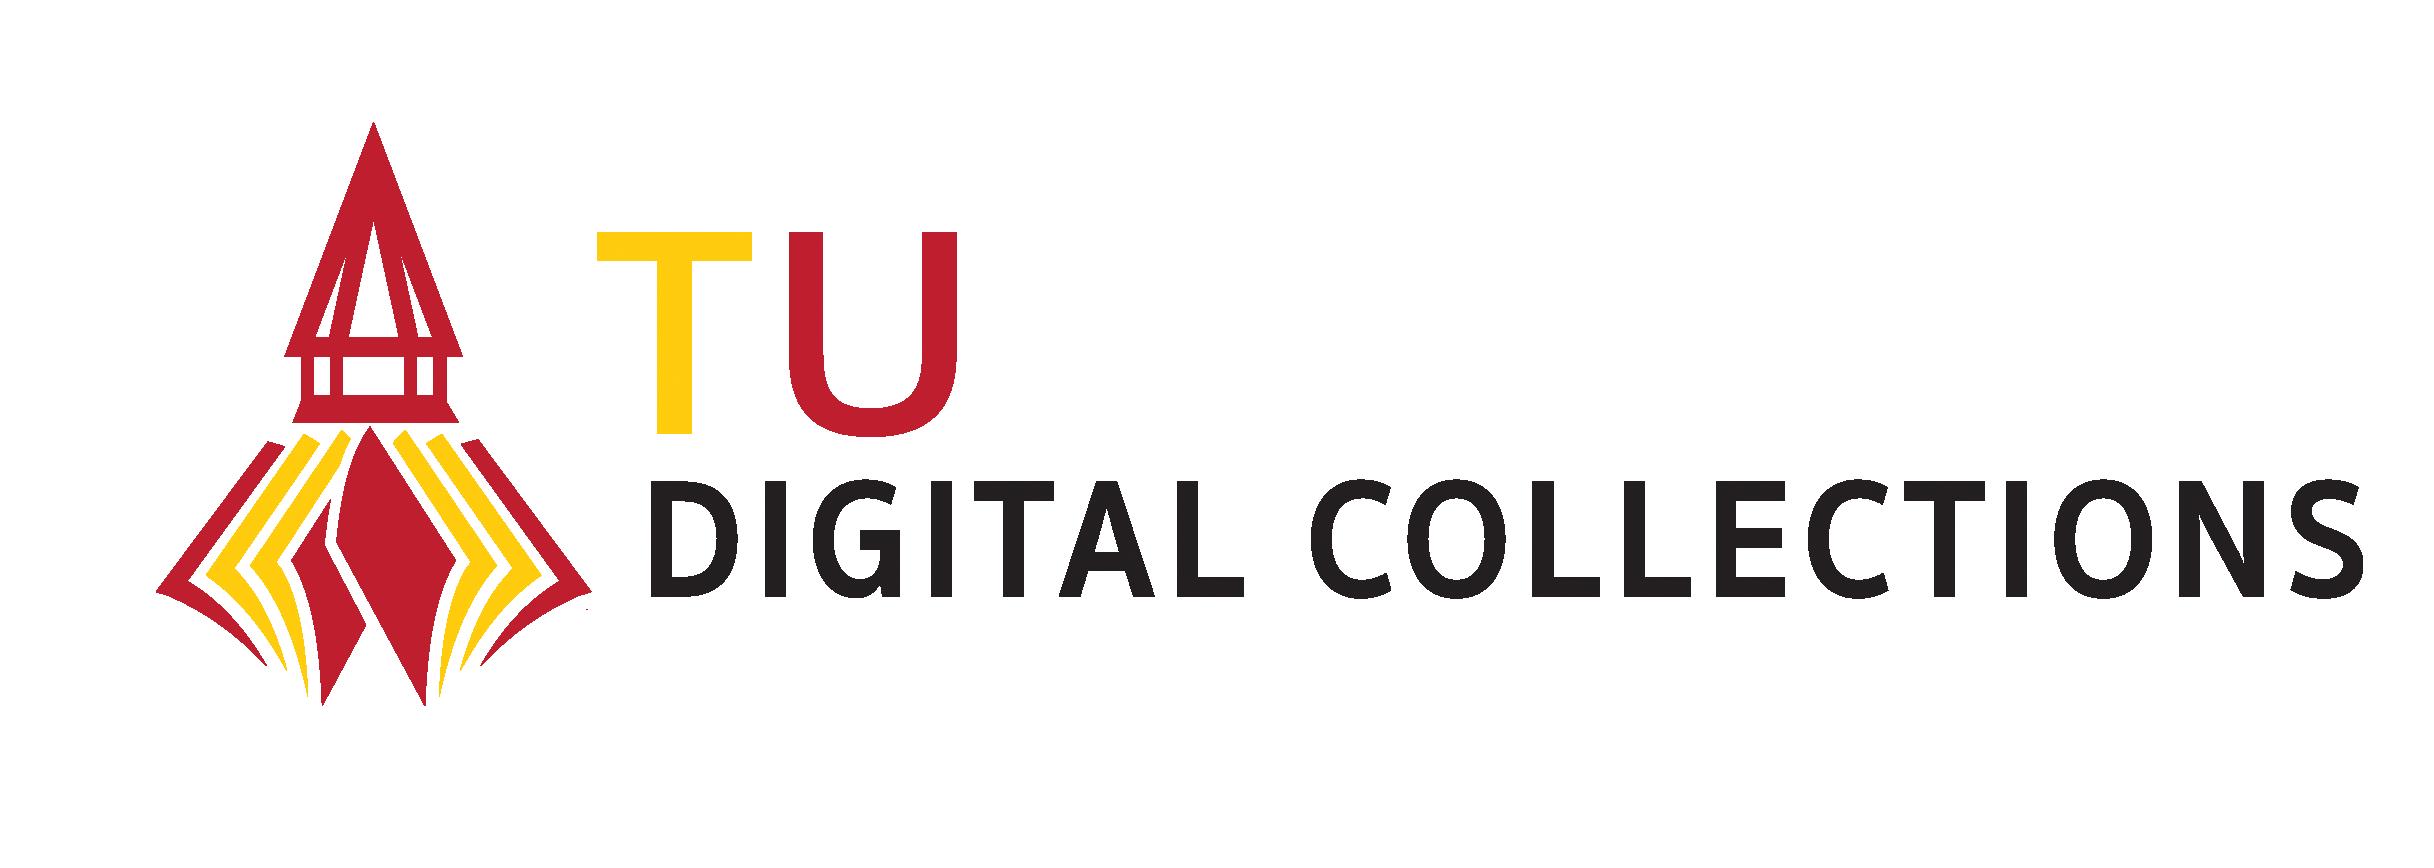 TU Digital Collections